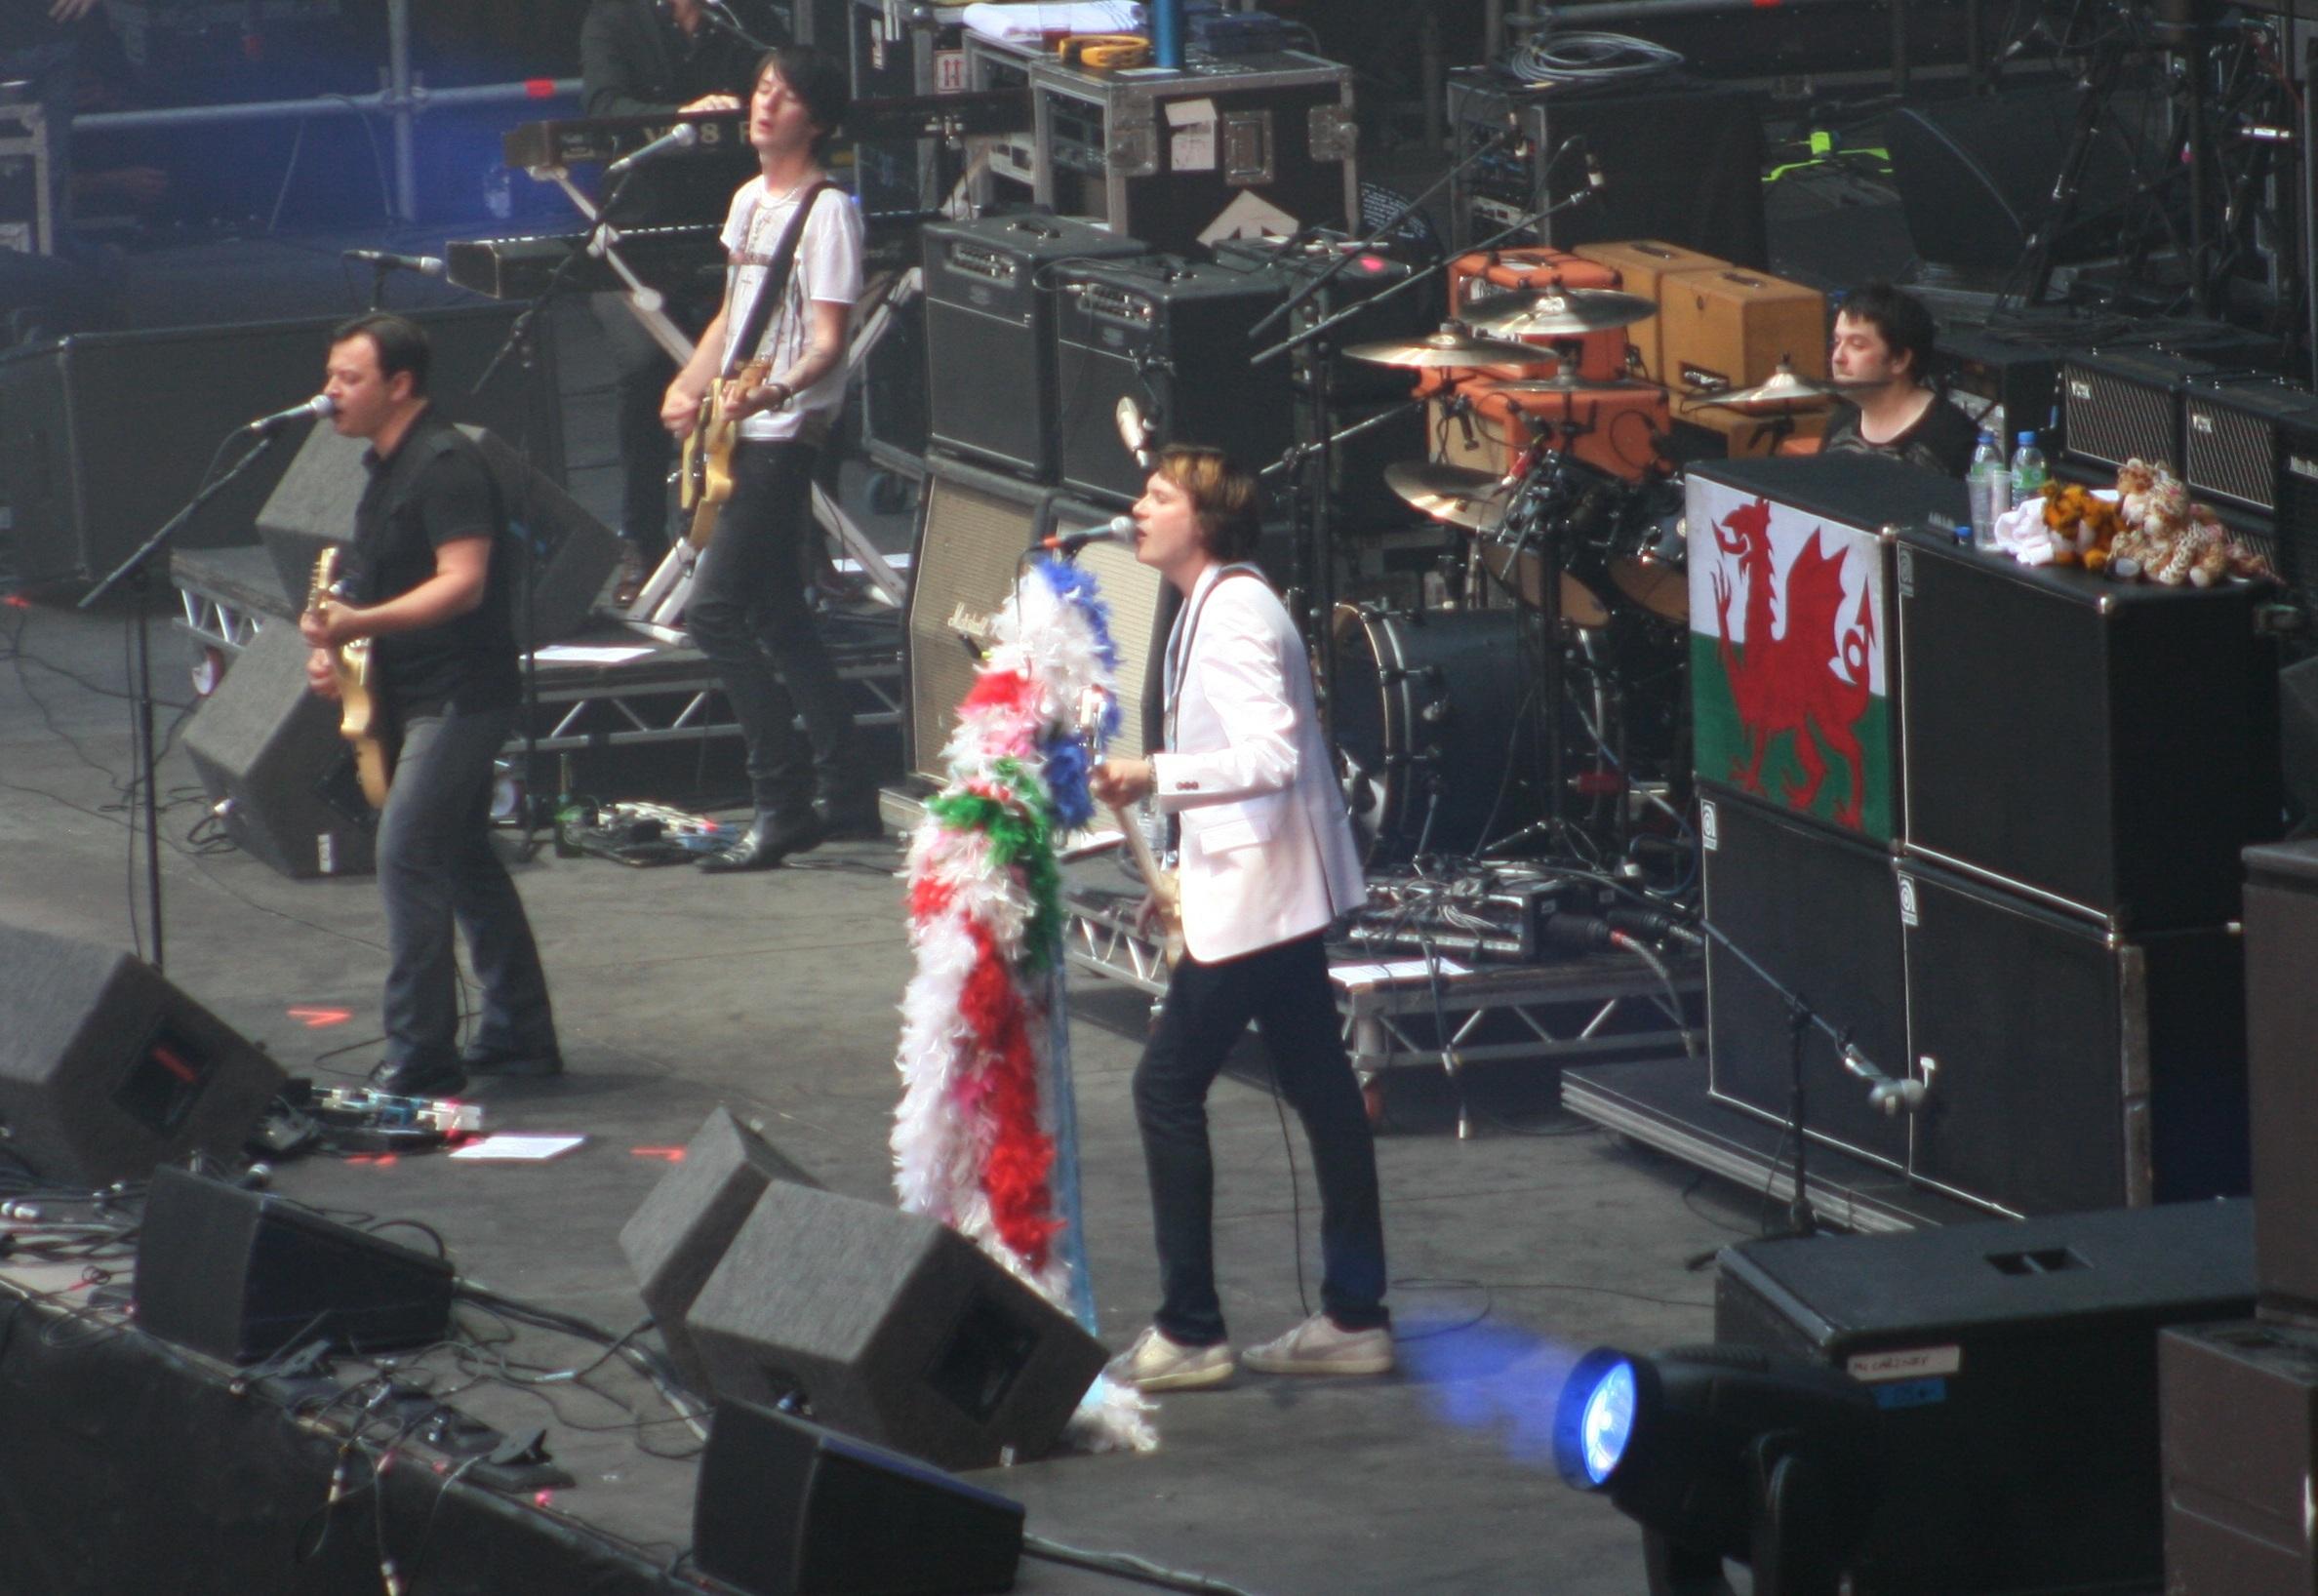 Manic_Street_Preachers_-_Cardiff_June_2010